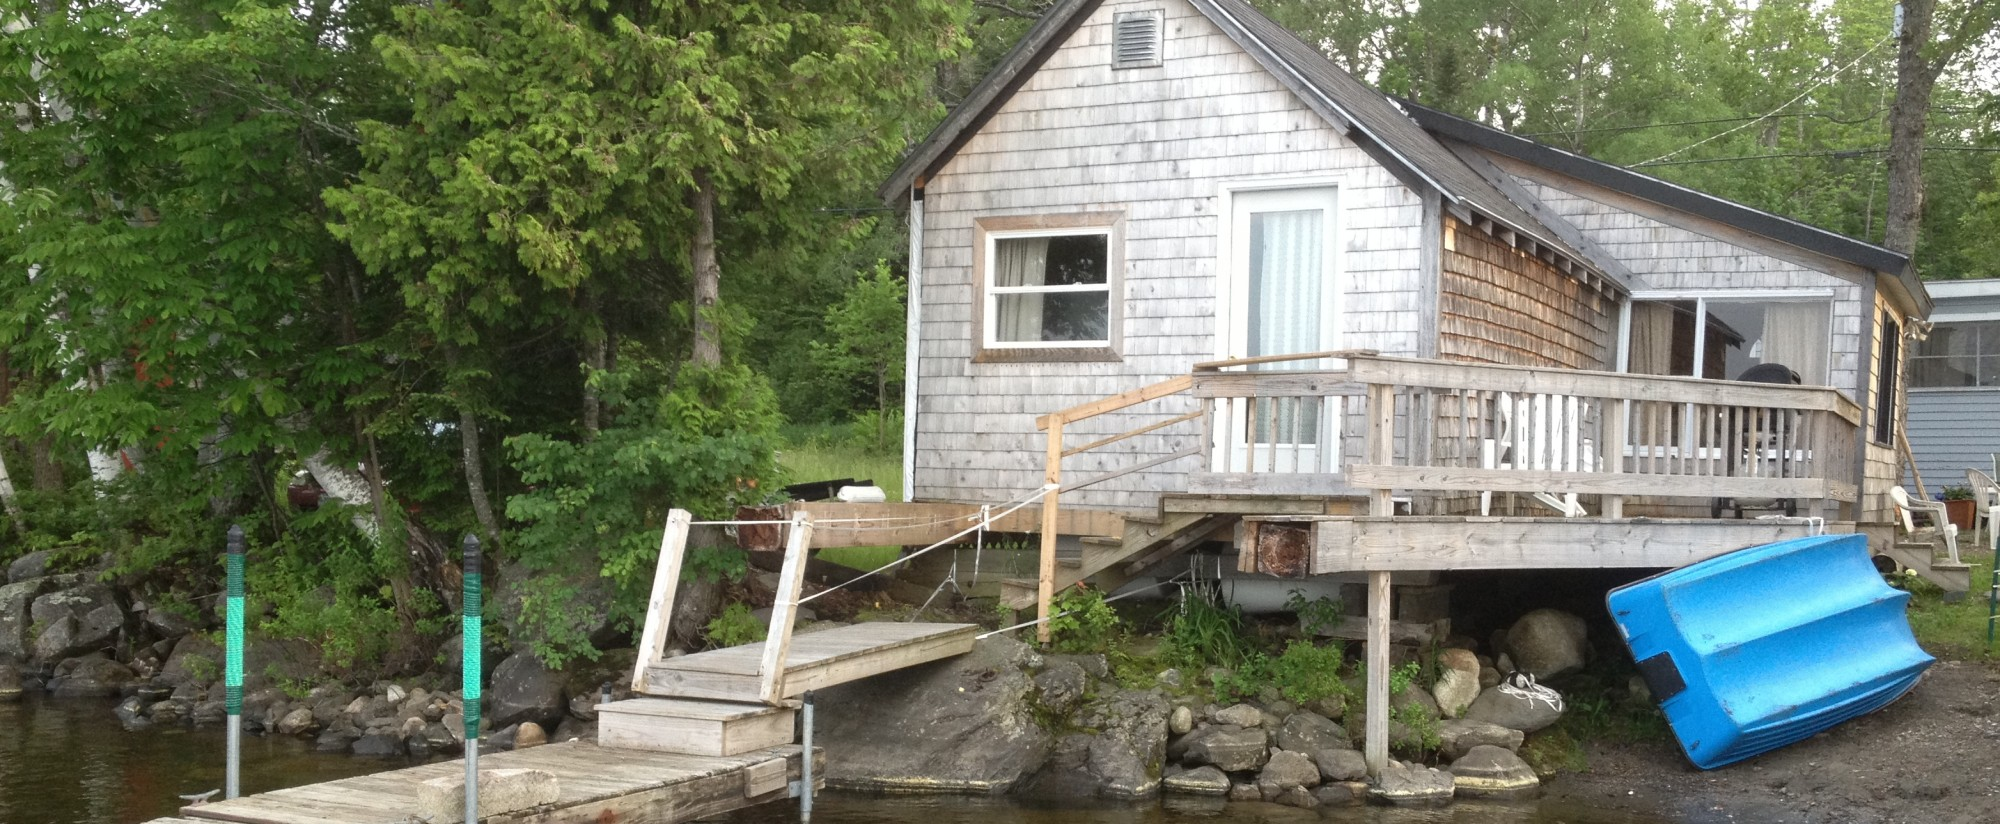 Marvelous Sebec Lake Vacation Cottage Lakefront Rental Camp In Maine Download Free Architecture Designs Scobabritishbridgeorg